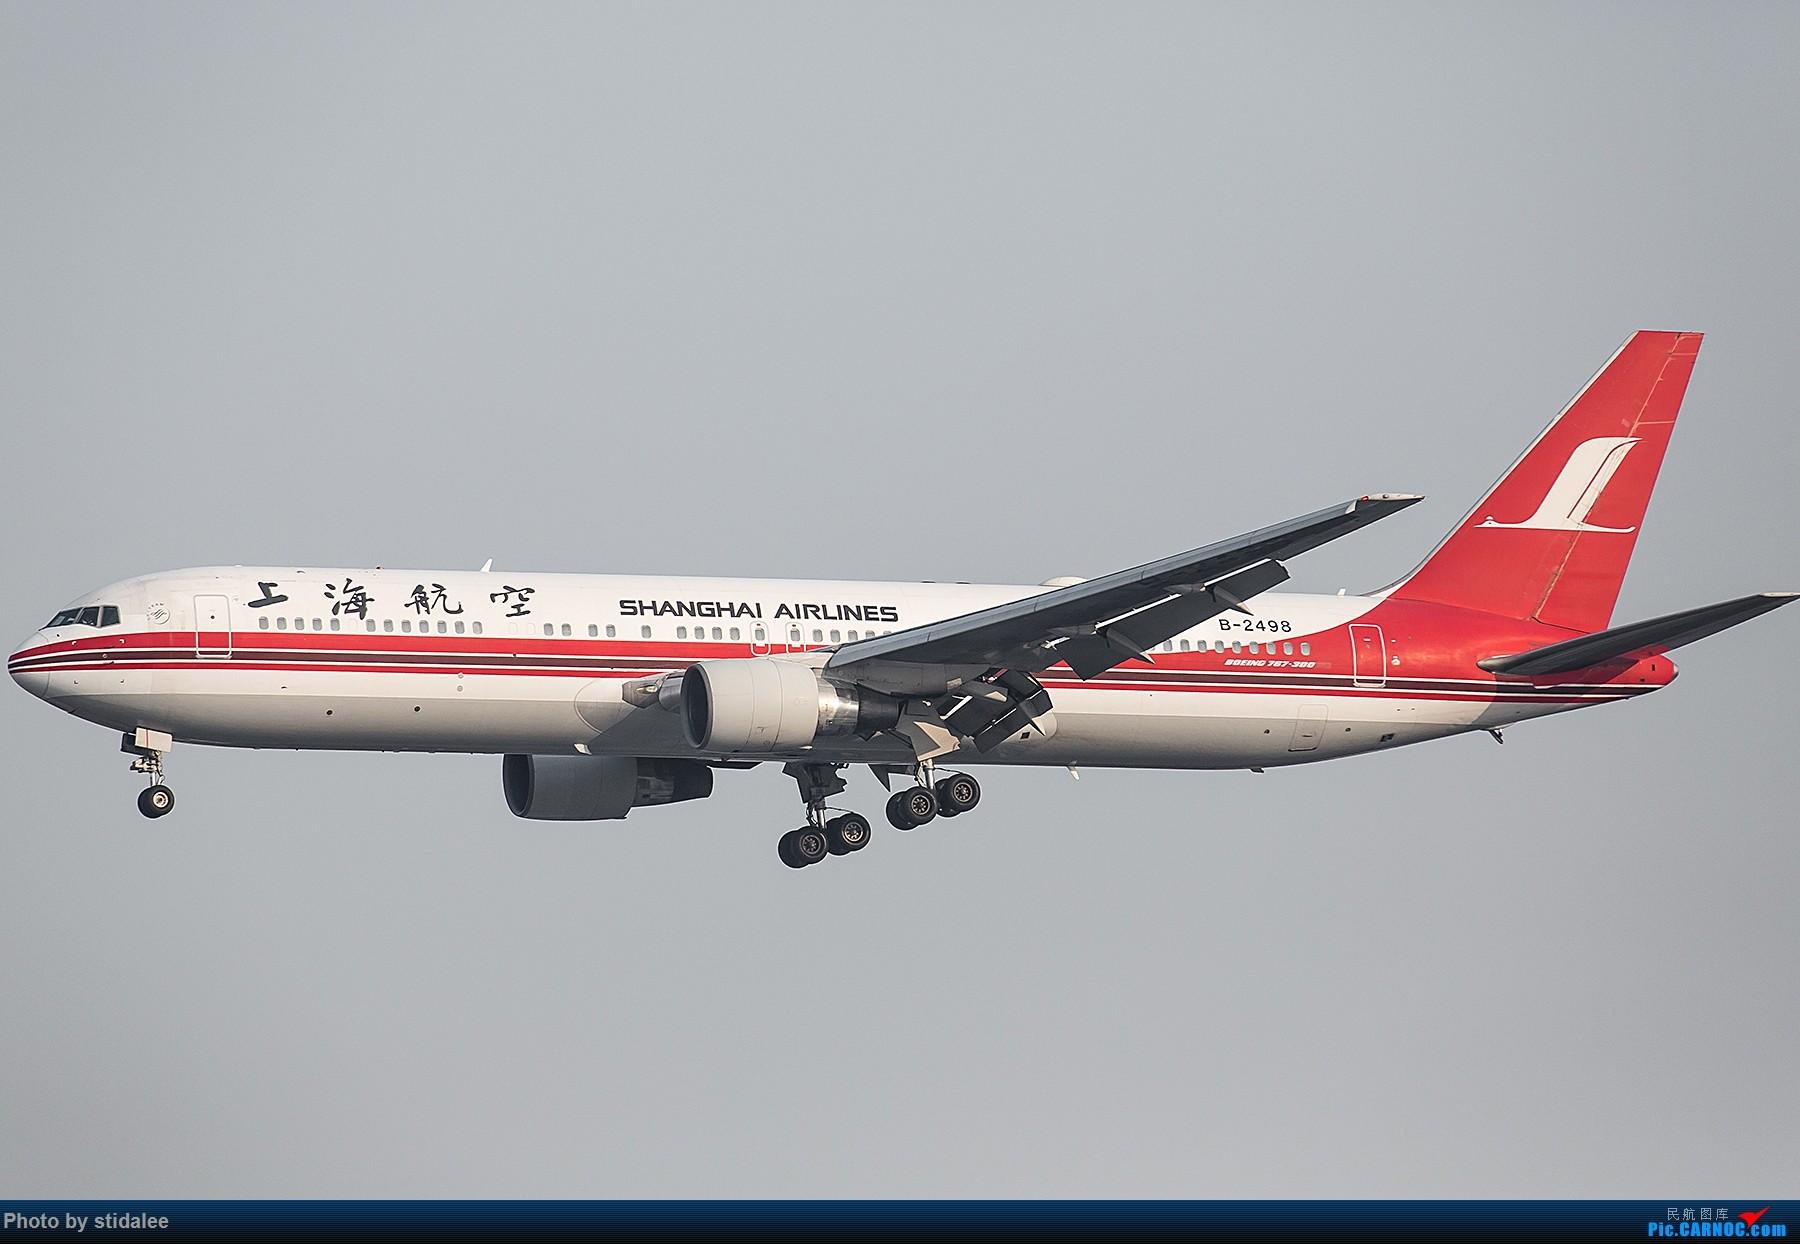 Re:[原创]SHA拍机 各种地主上航飞机 最喜欢的涂装 BOEING 767-300 B-2498 中国上海虹桥国际机场